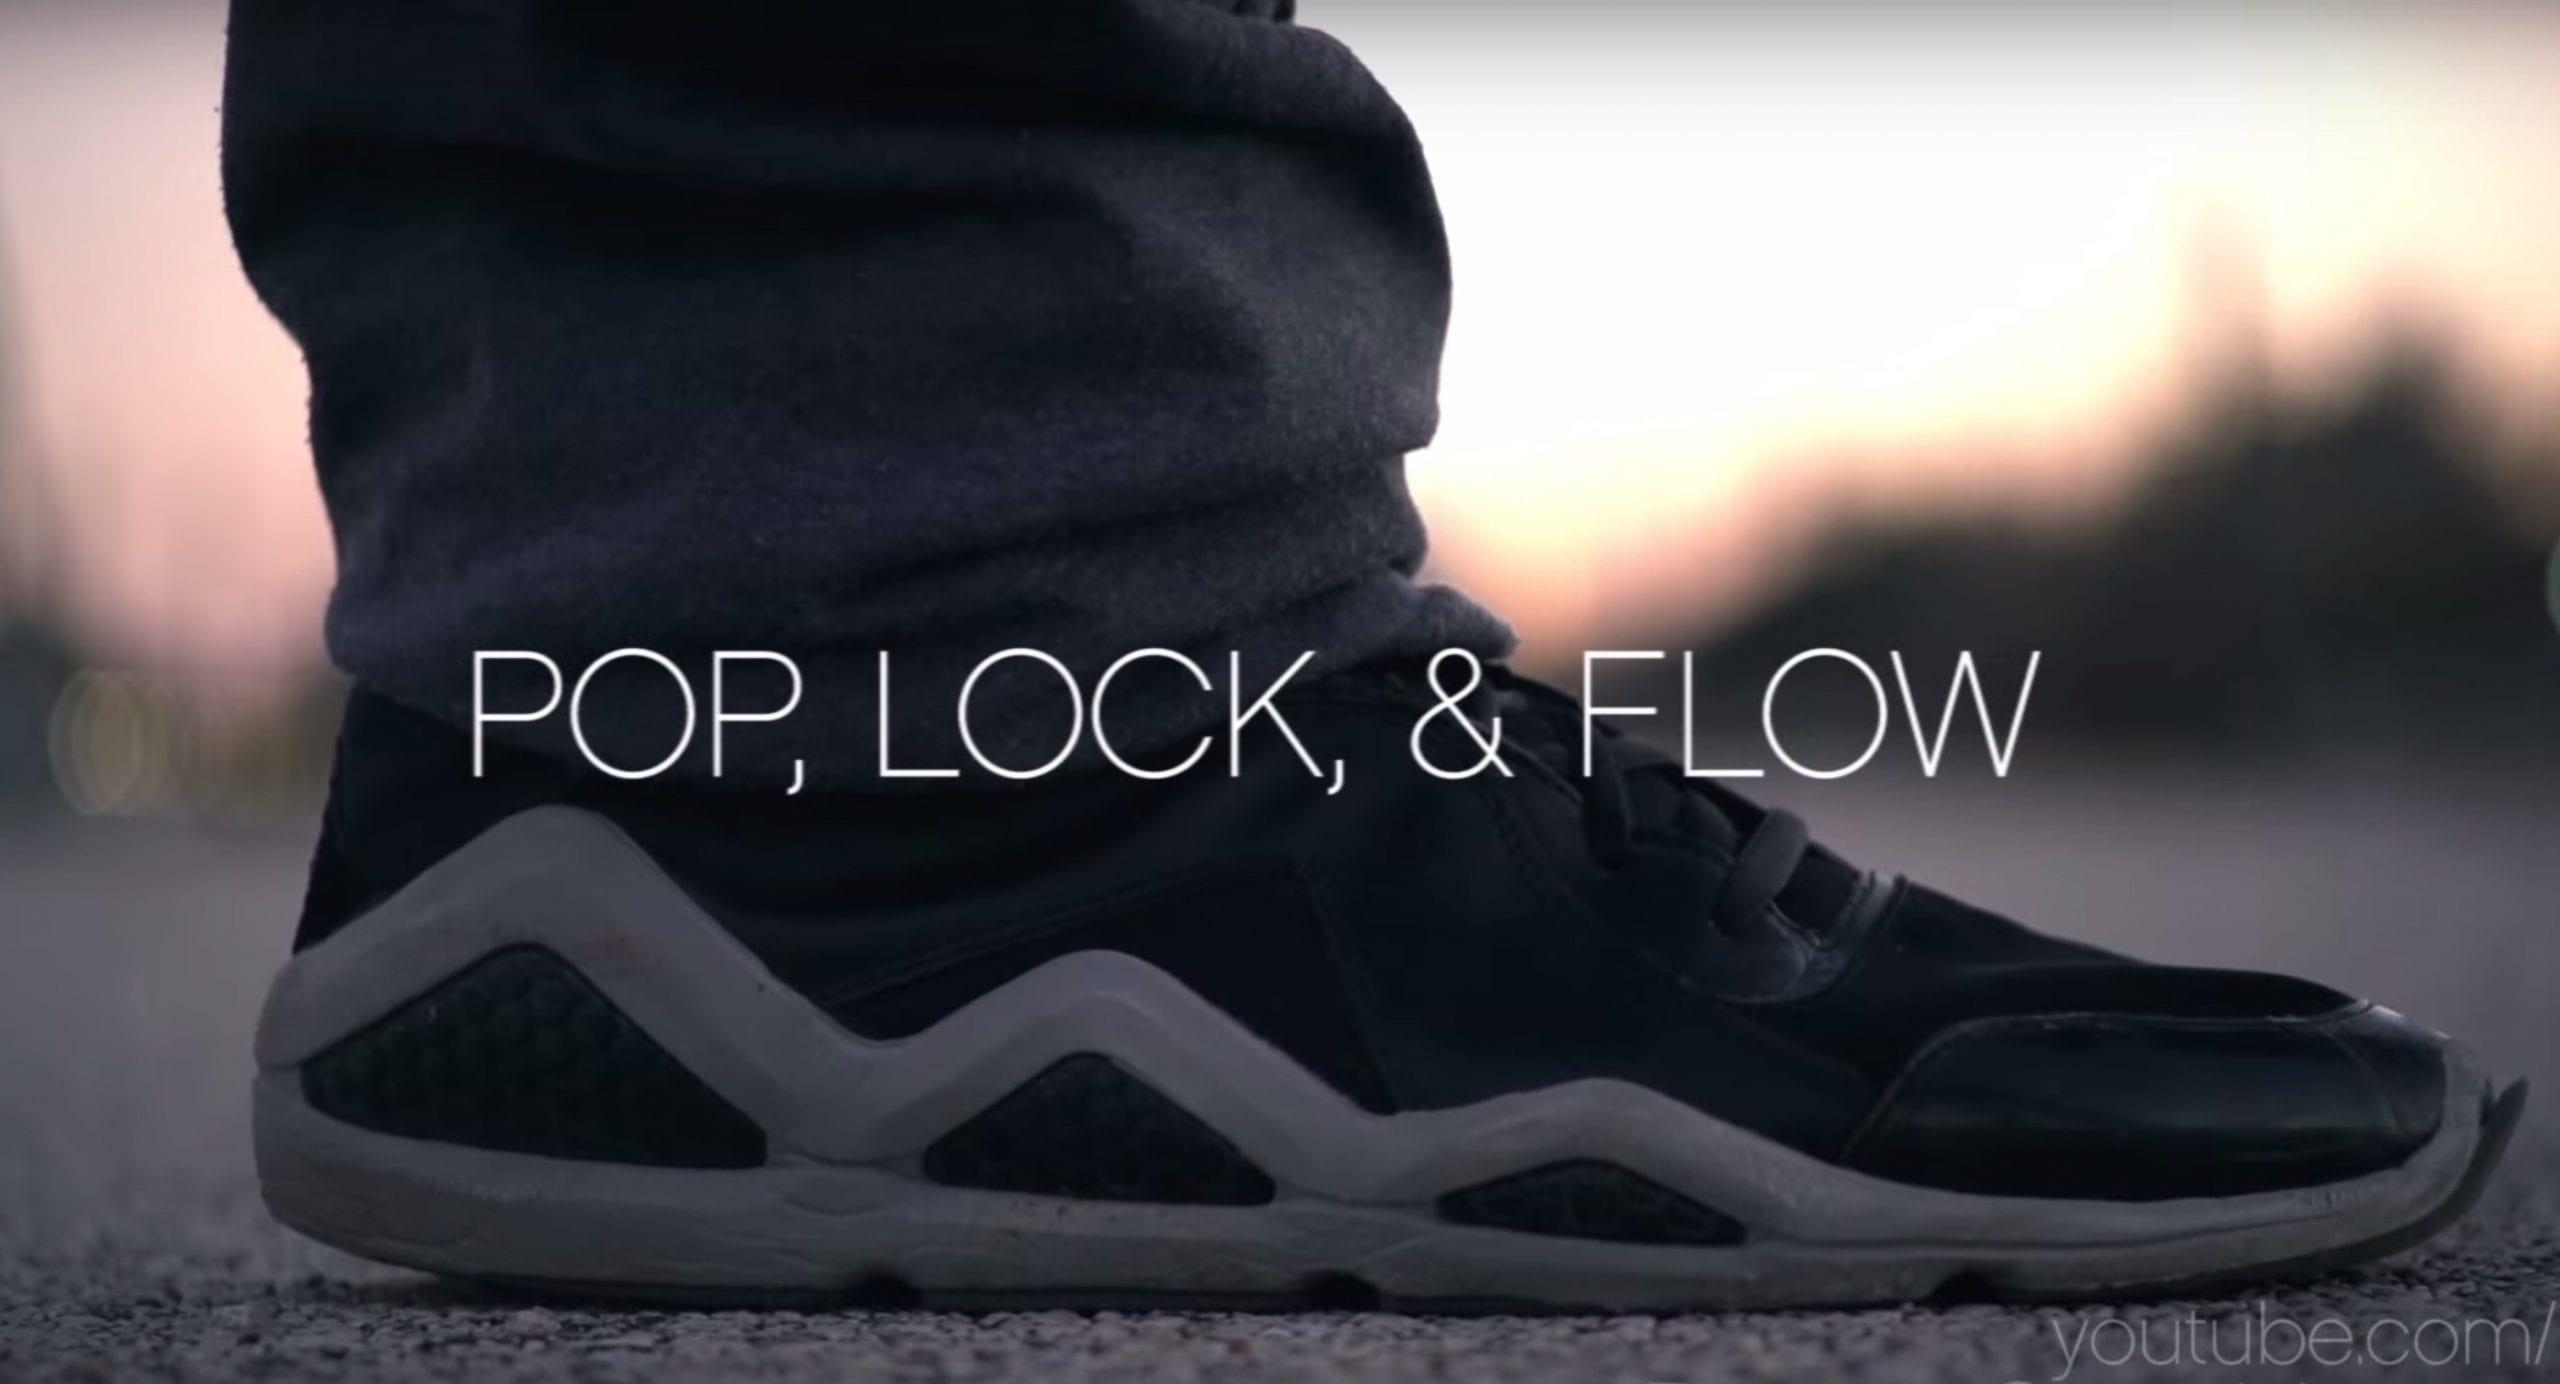 Pop, Lock, & Flow